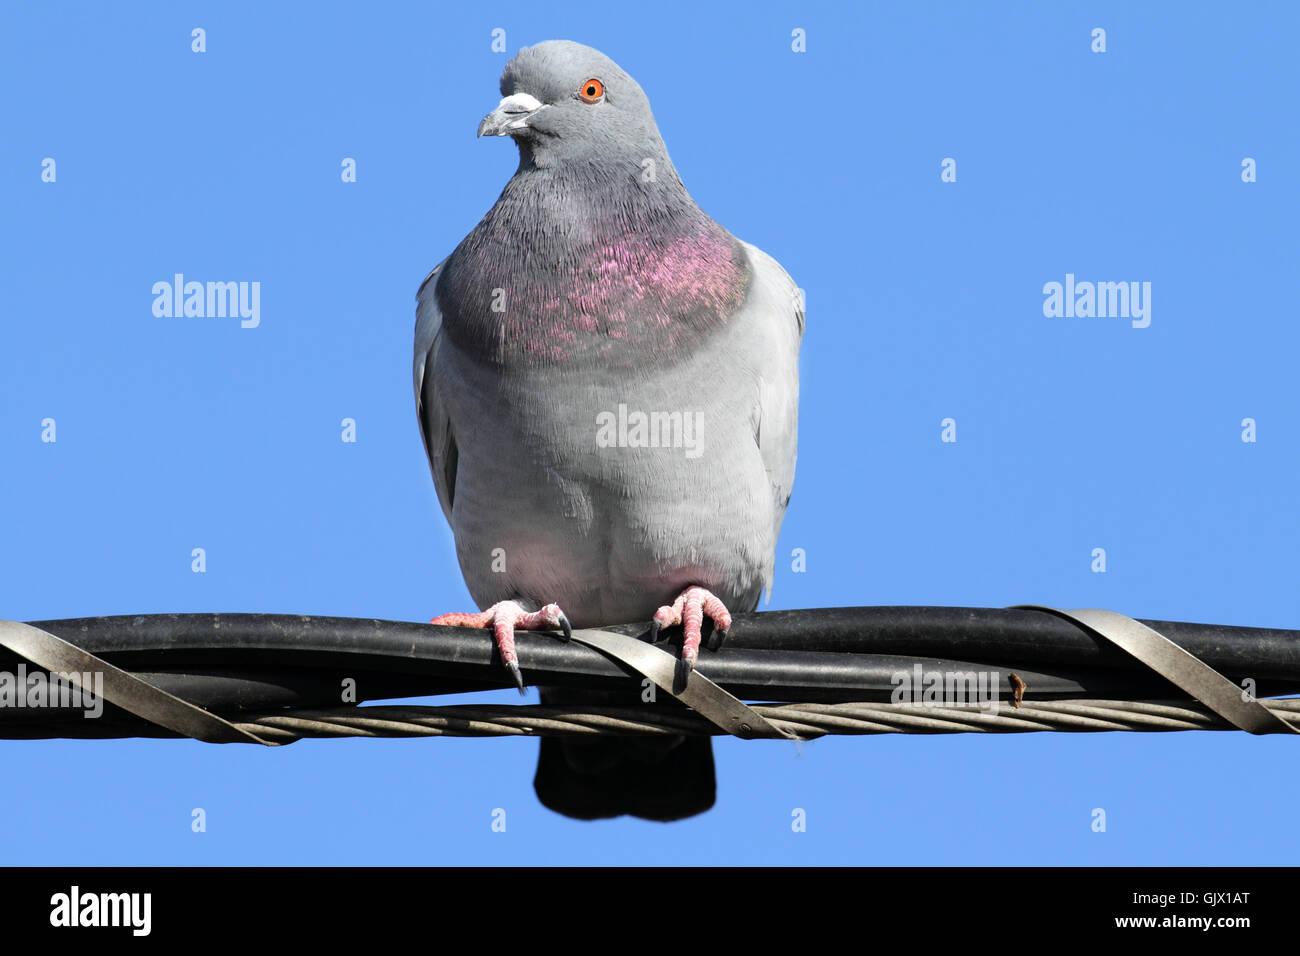 bird wild wildlife - Stock Image